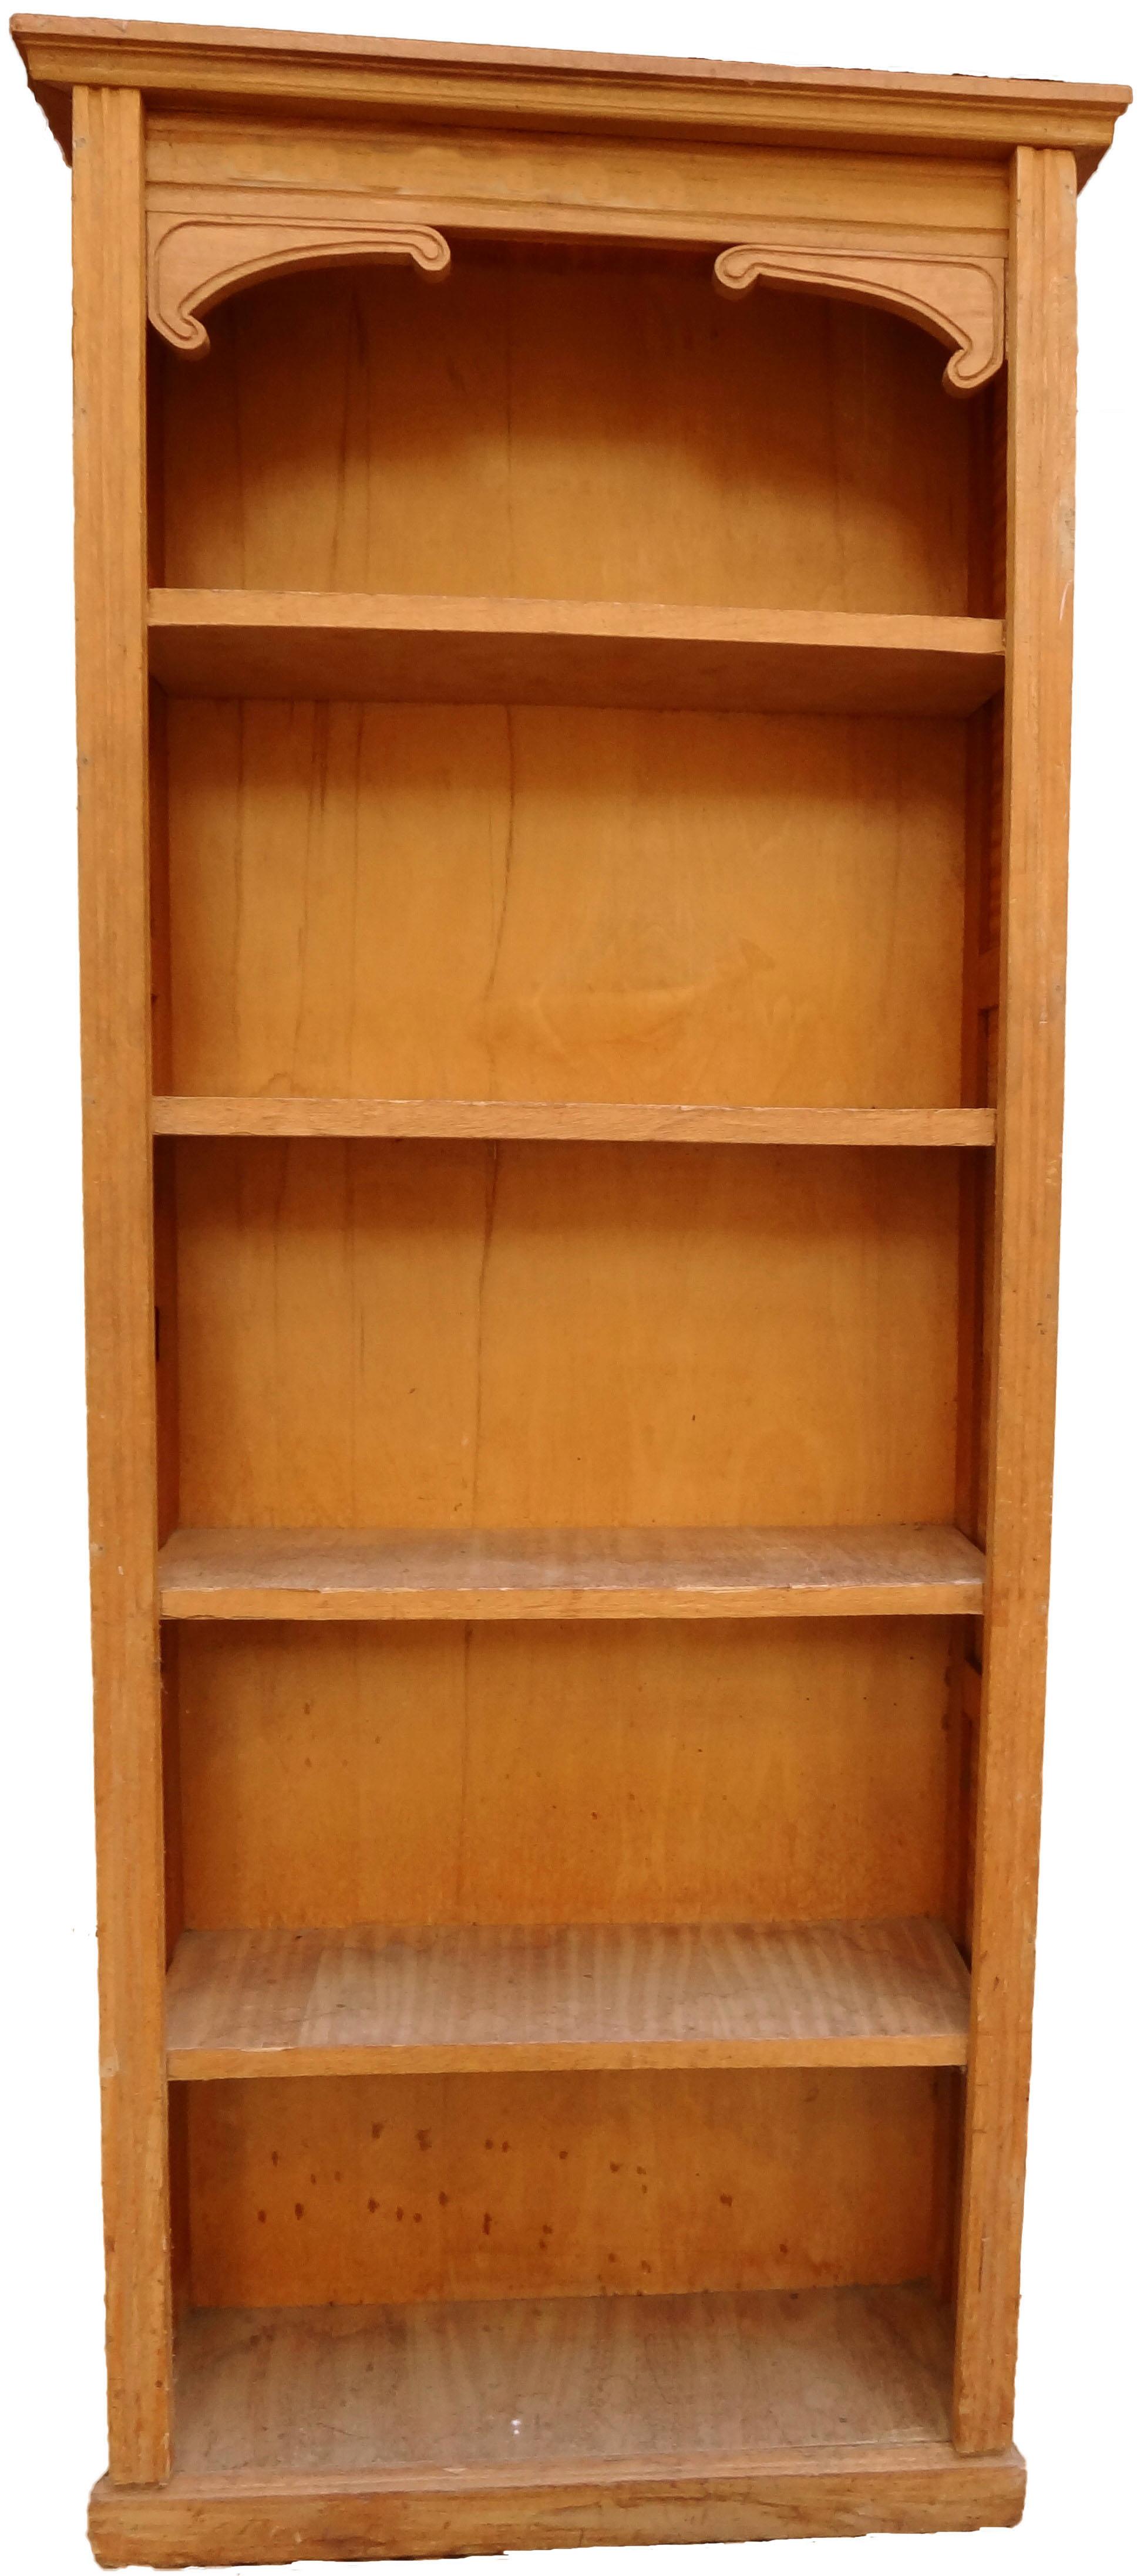 Bibliotecas Y Cristaleros Carpinteria Restauracion - Bibliotecas-de-madera